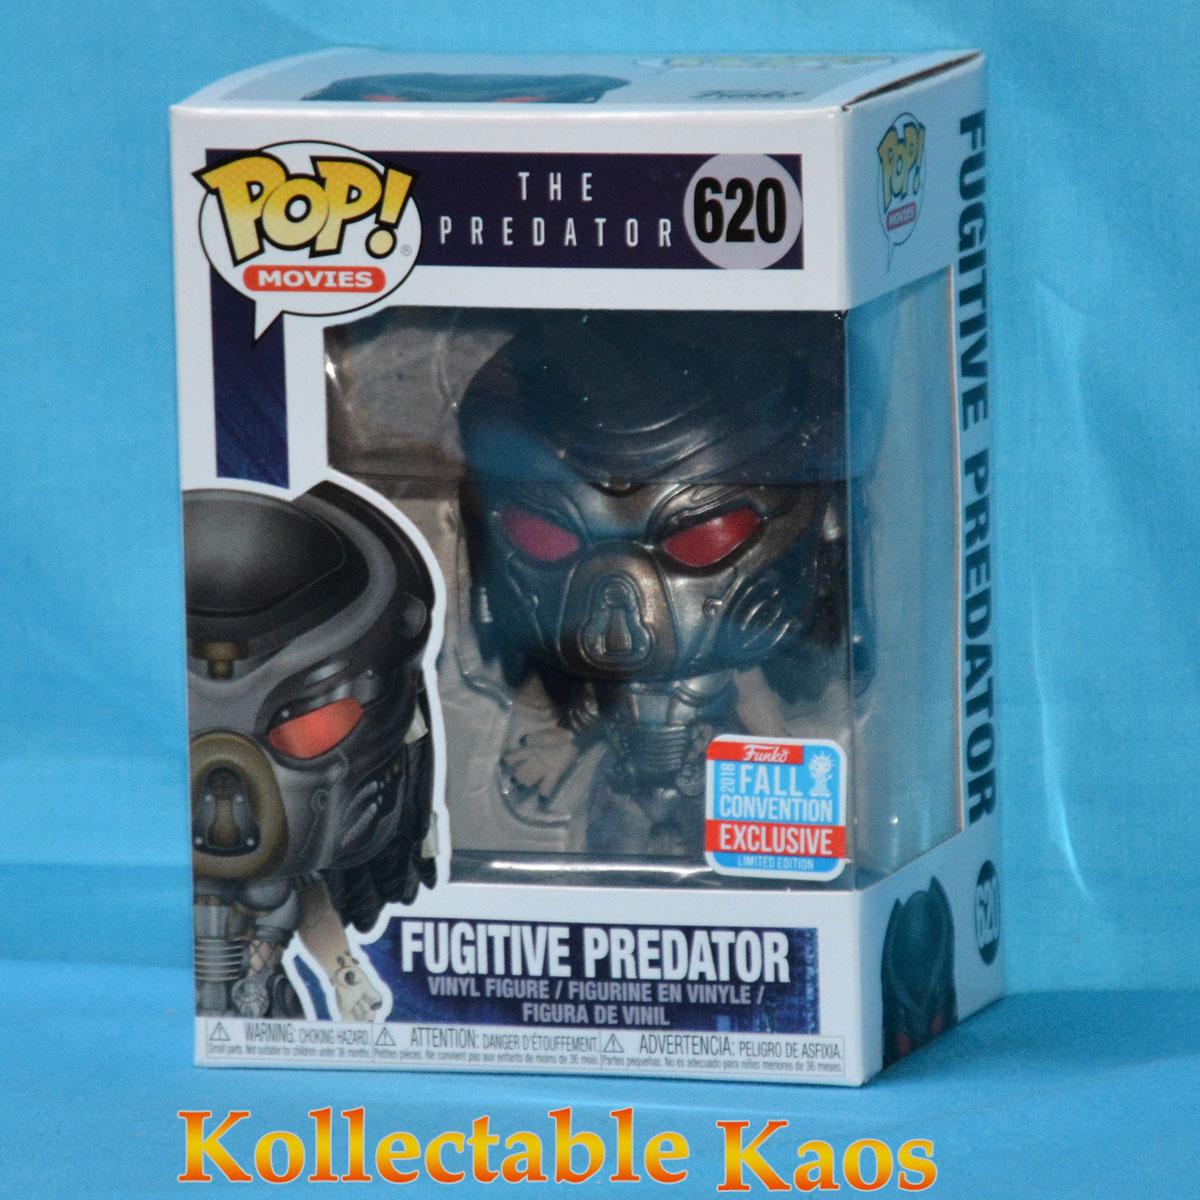 NYCC 2018 Funko Pop Vinyl The Predator Fugitive Predator Translucent Excl NEW